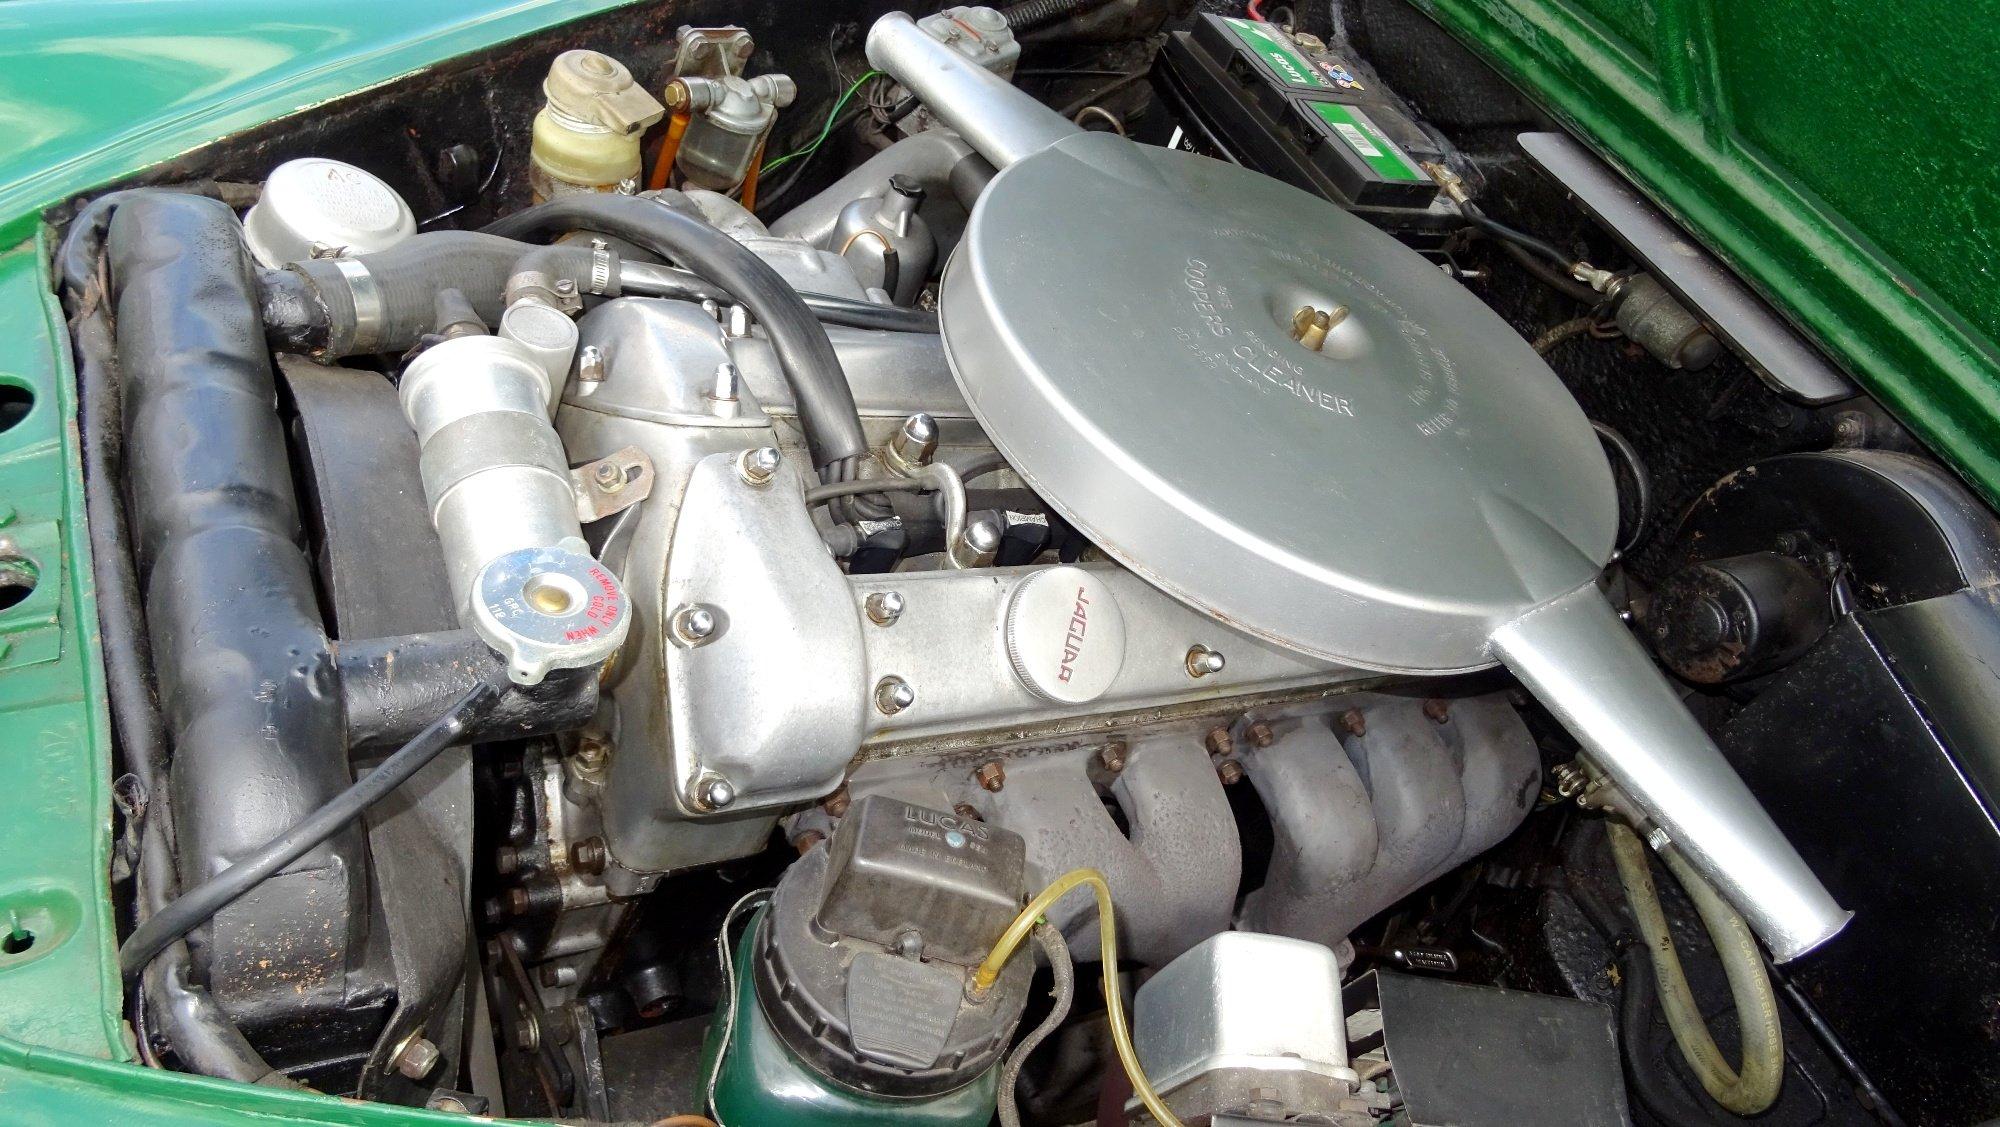 1961 JAGUAR MK2 3.8 LITRE BEAUTIFUL BRITISH CLASSIC CAR For Sale (picture 5 of 6)